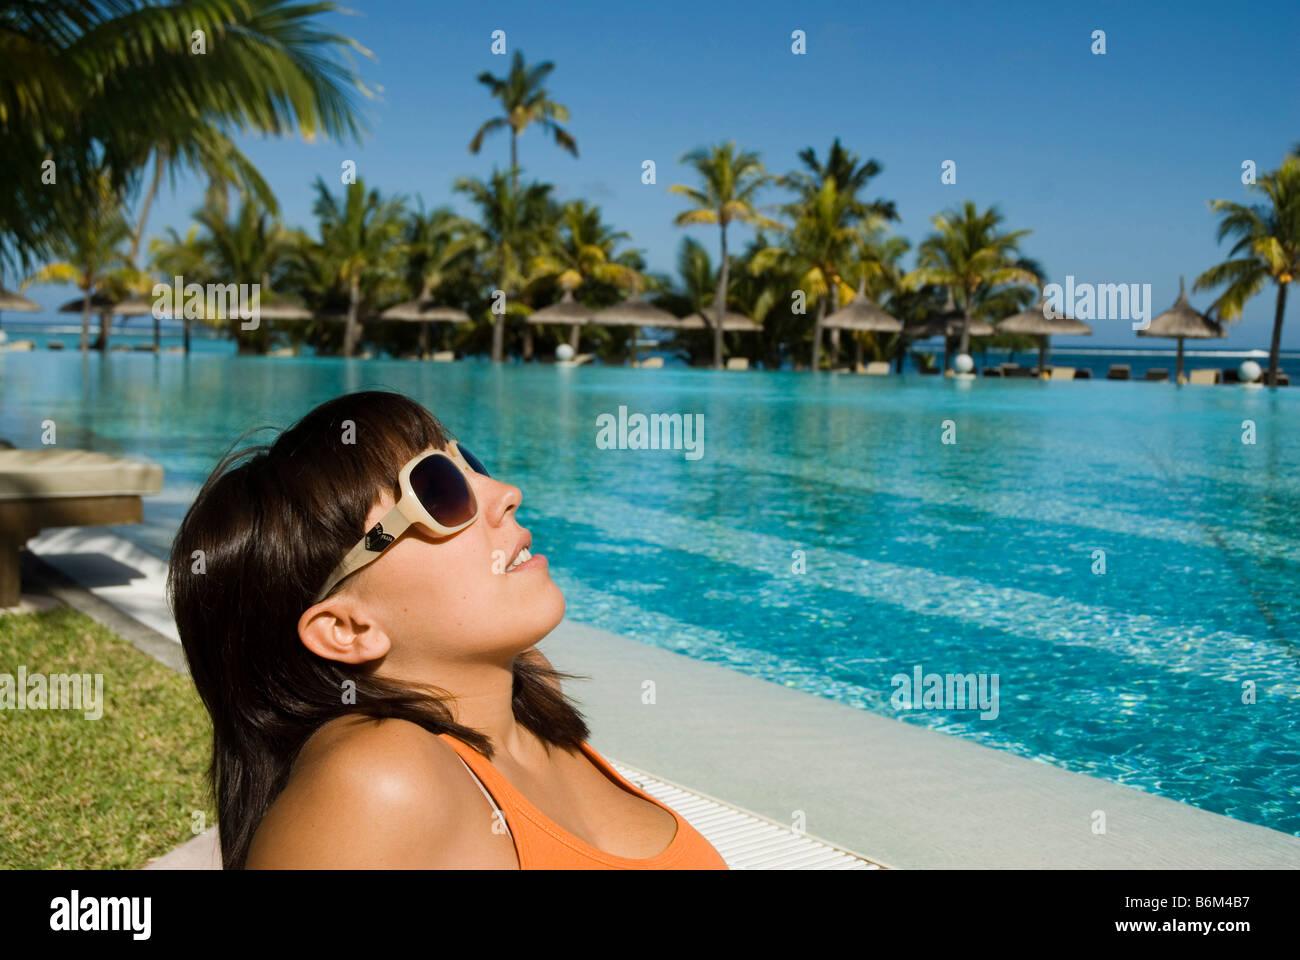 Hotel Dinarobin in Le Morne MAURITIUS ISLAND Stock Photo